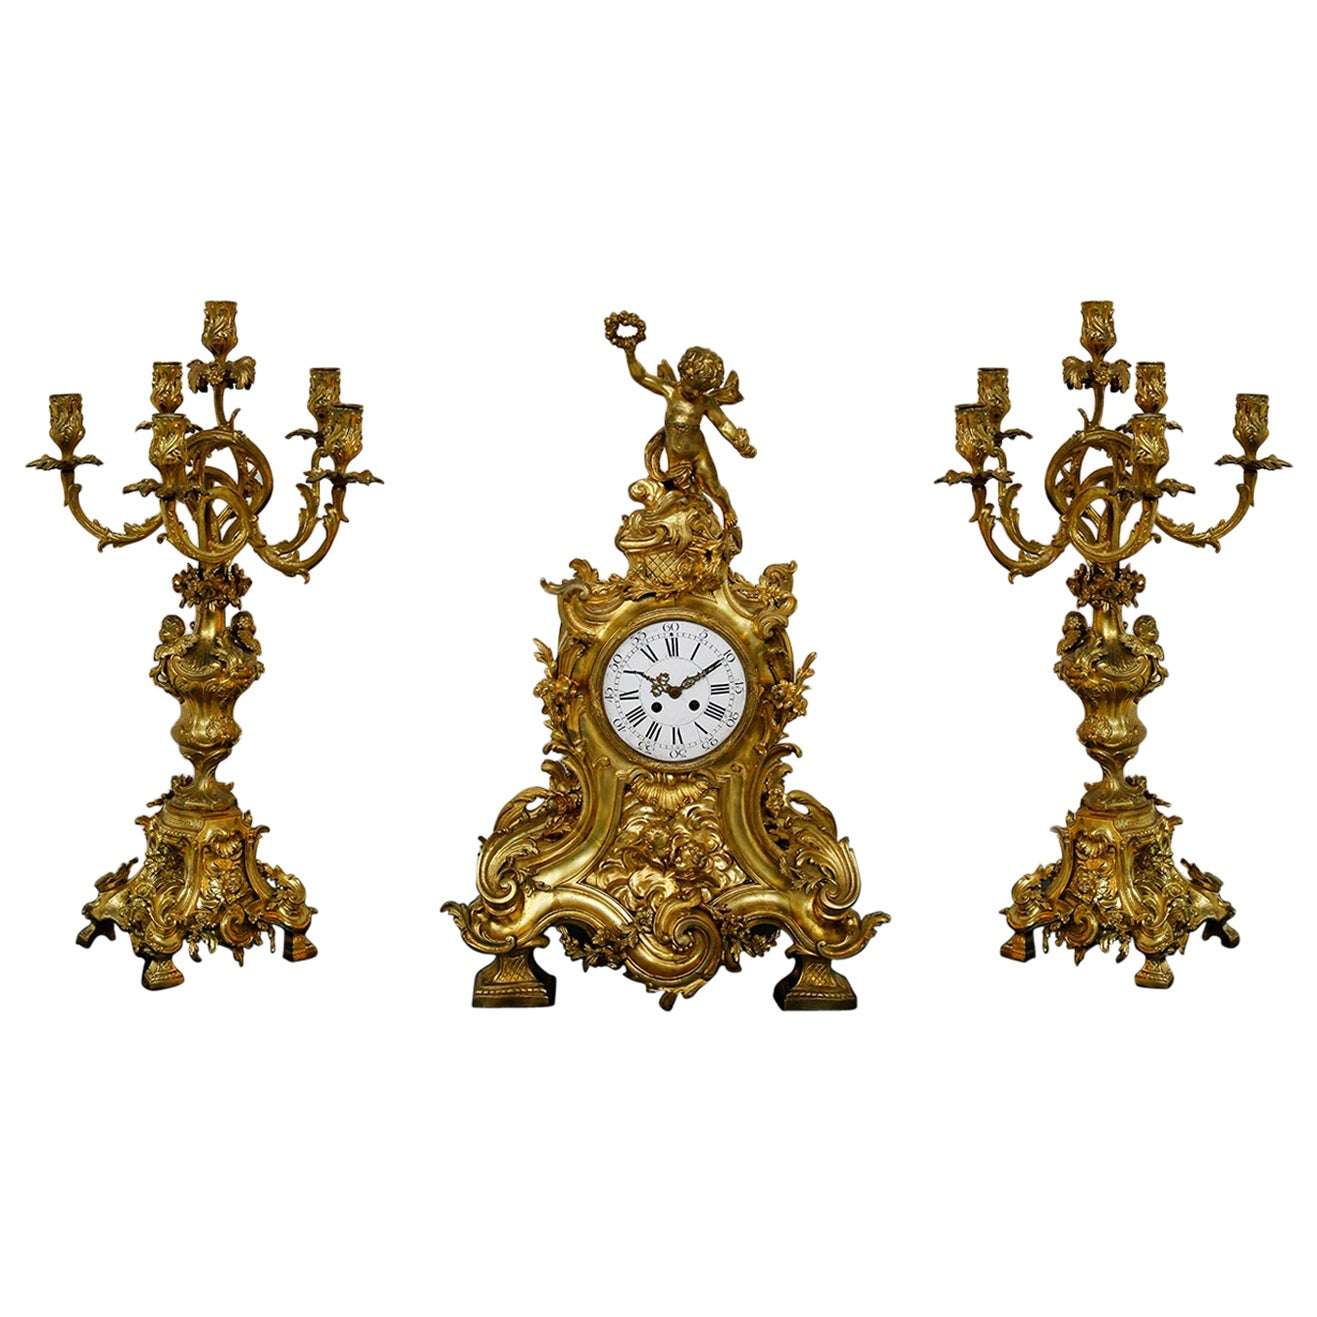 Three-Piece Clock by Samuel Marti Attributed Alfred Emmanuel Louis Beurdeley